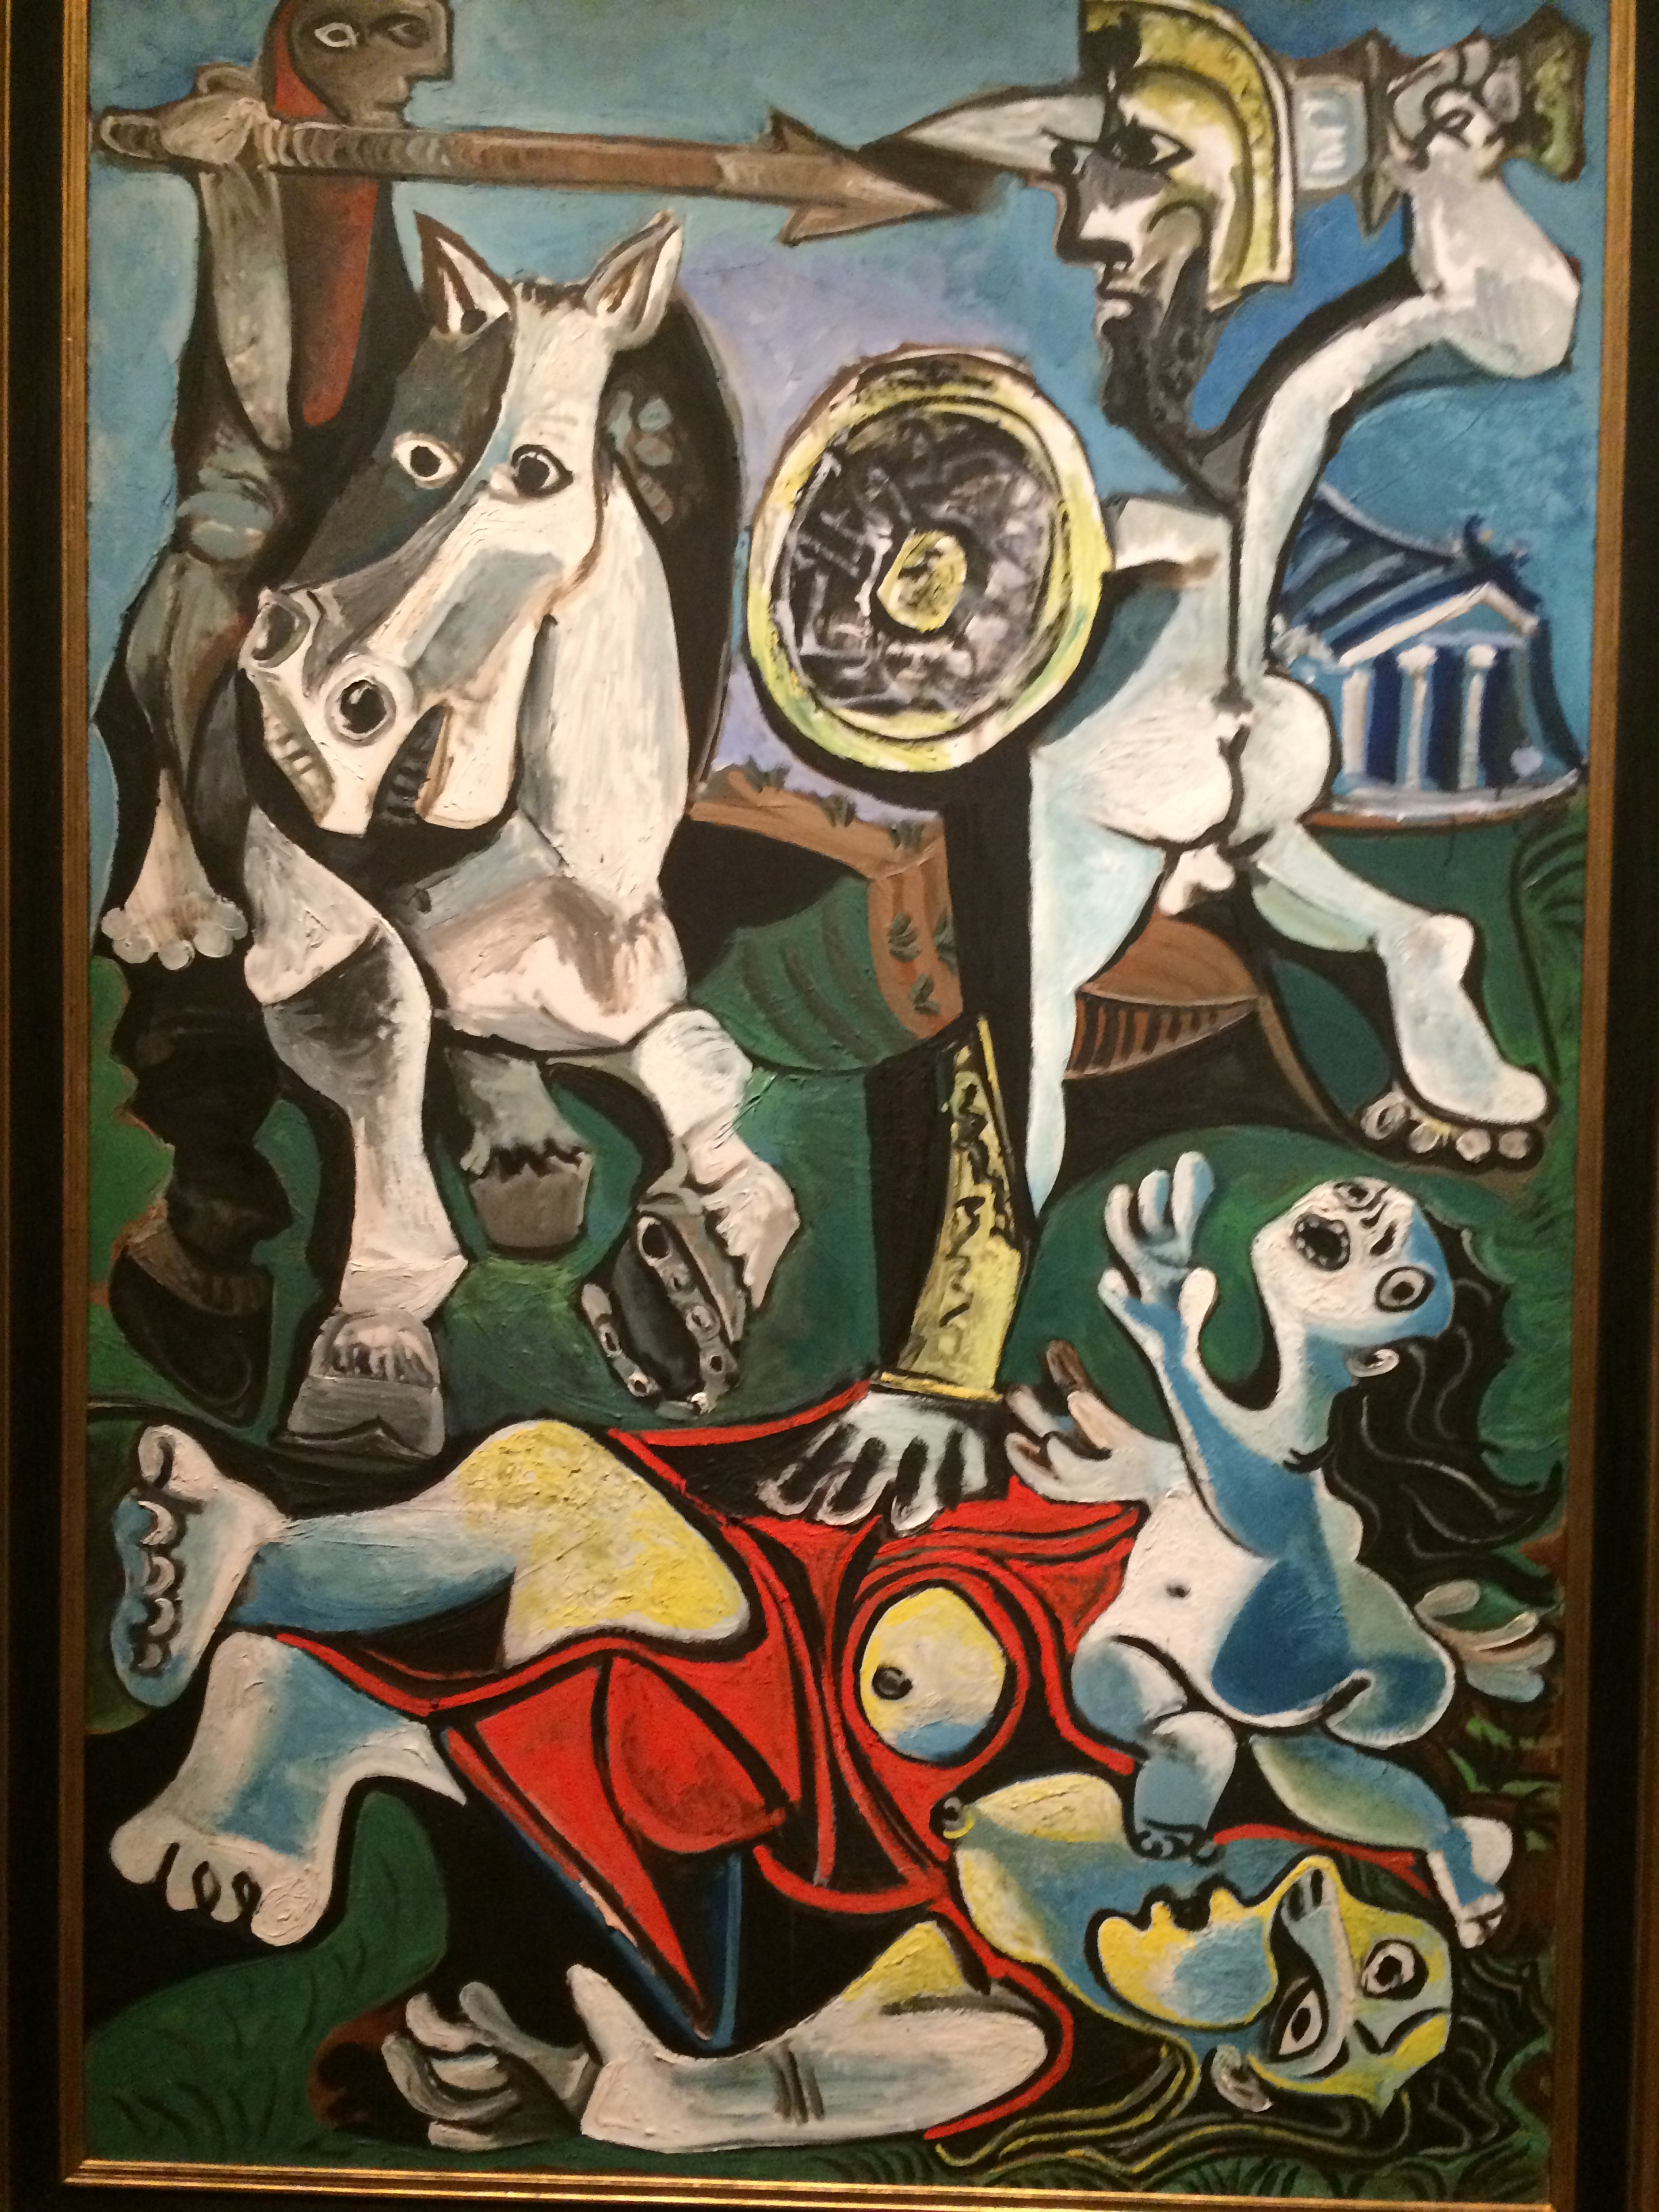 picasso dover fine art history of art